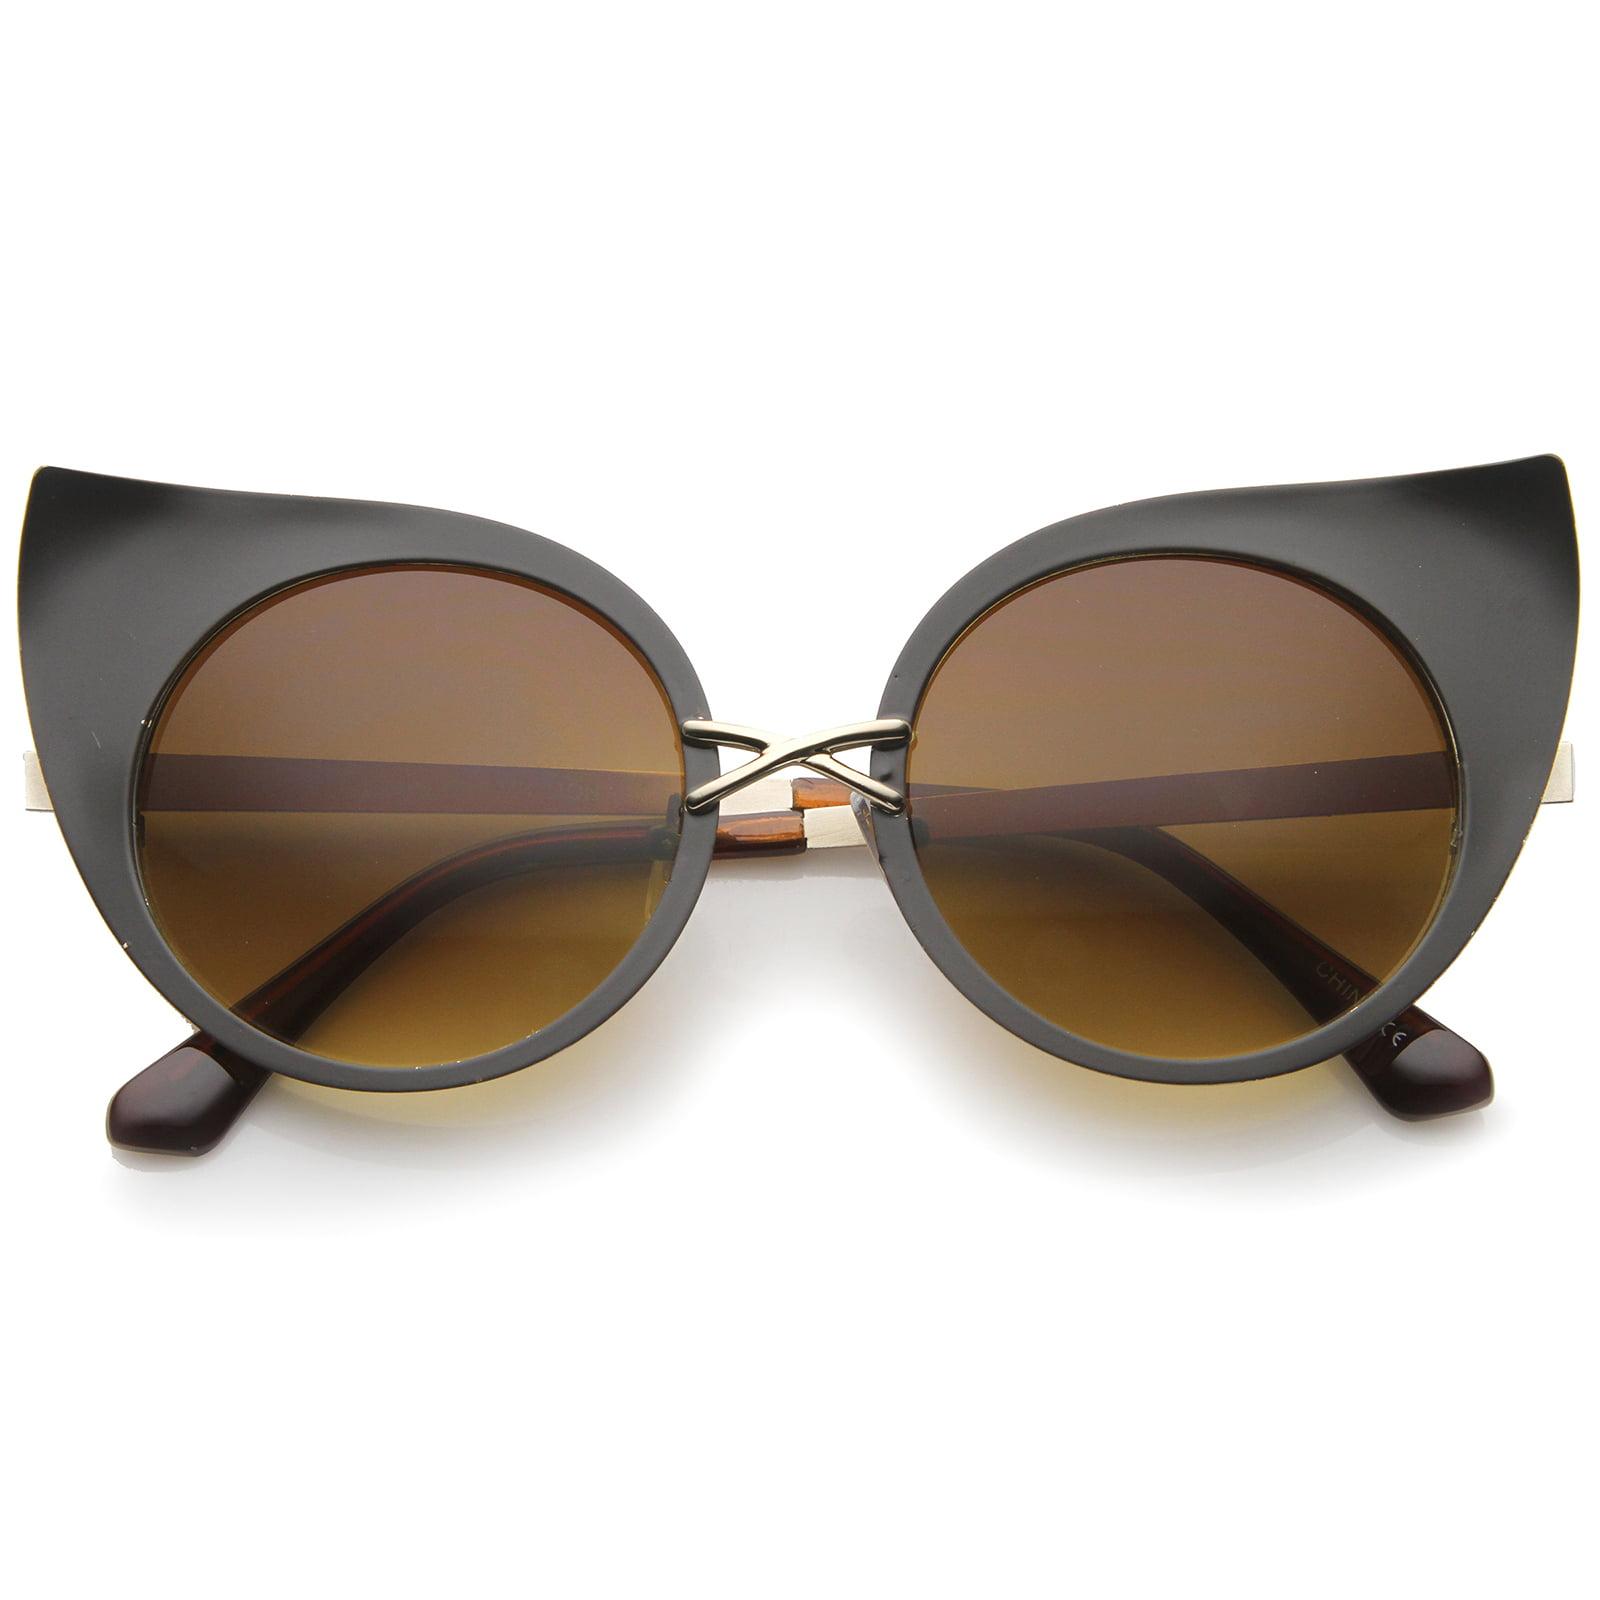 sunglassLA - Women's Fashion Exaggerated Curved Round Cat Eye Sunglasses - 47mm